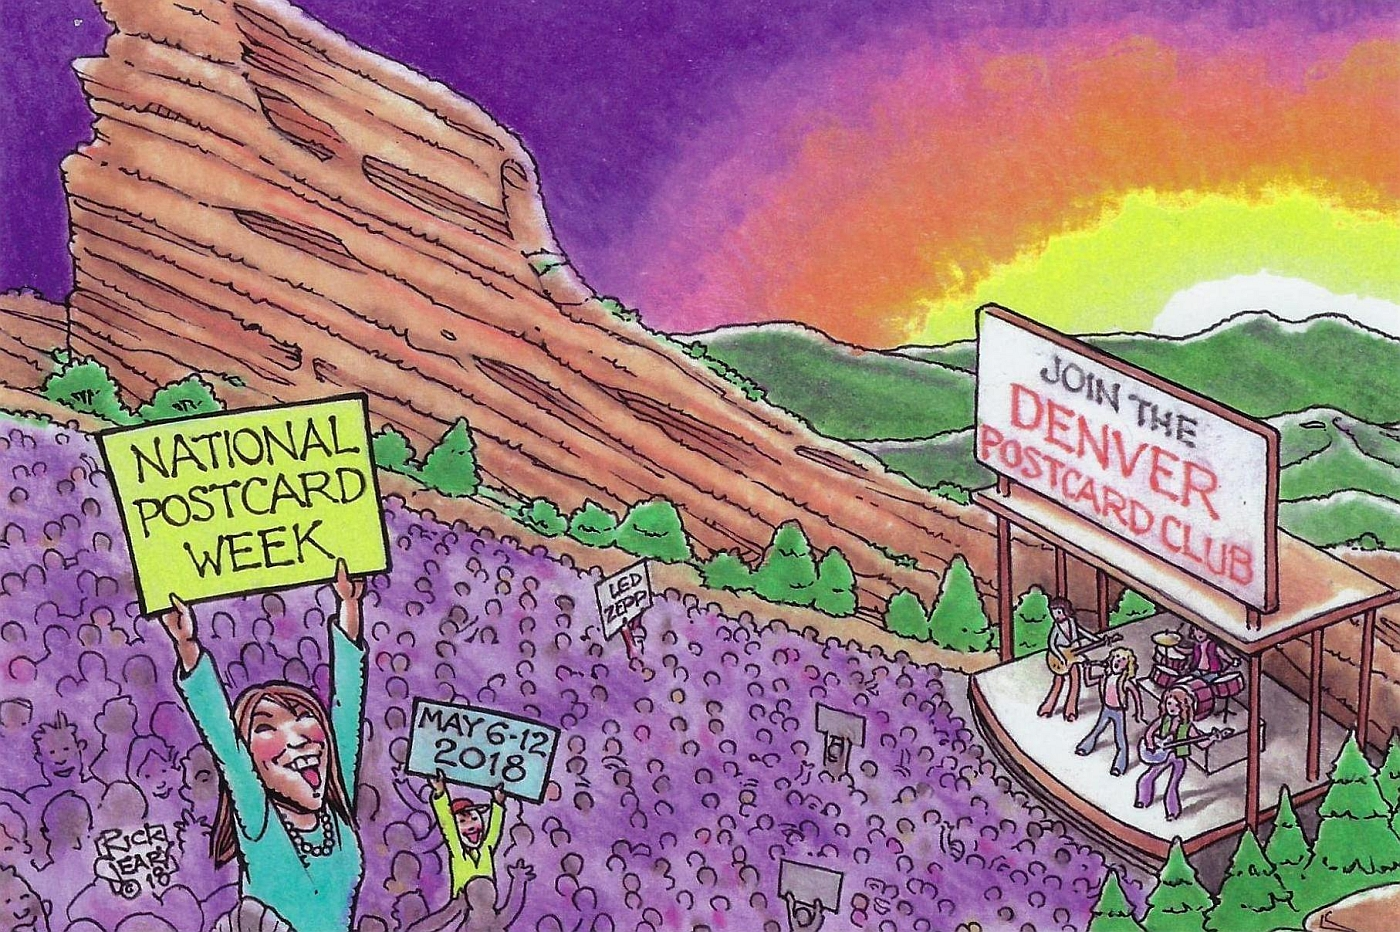 Denver Postcard Club's National Postcard Week 2018 card!